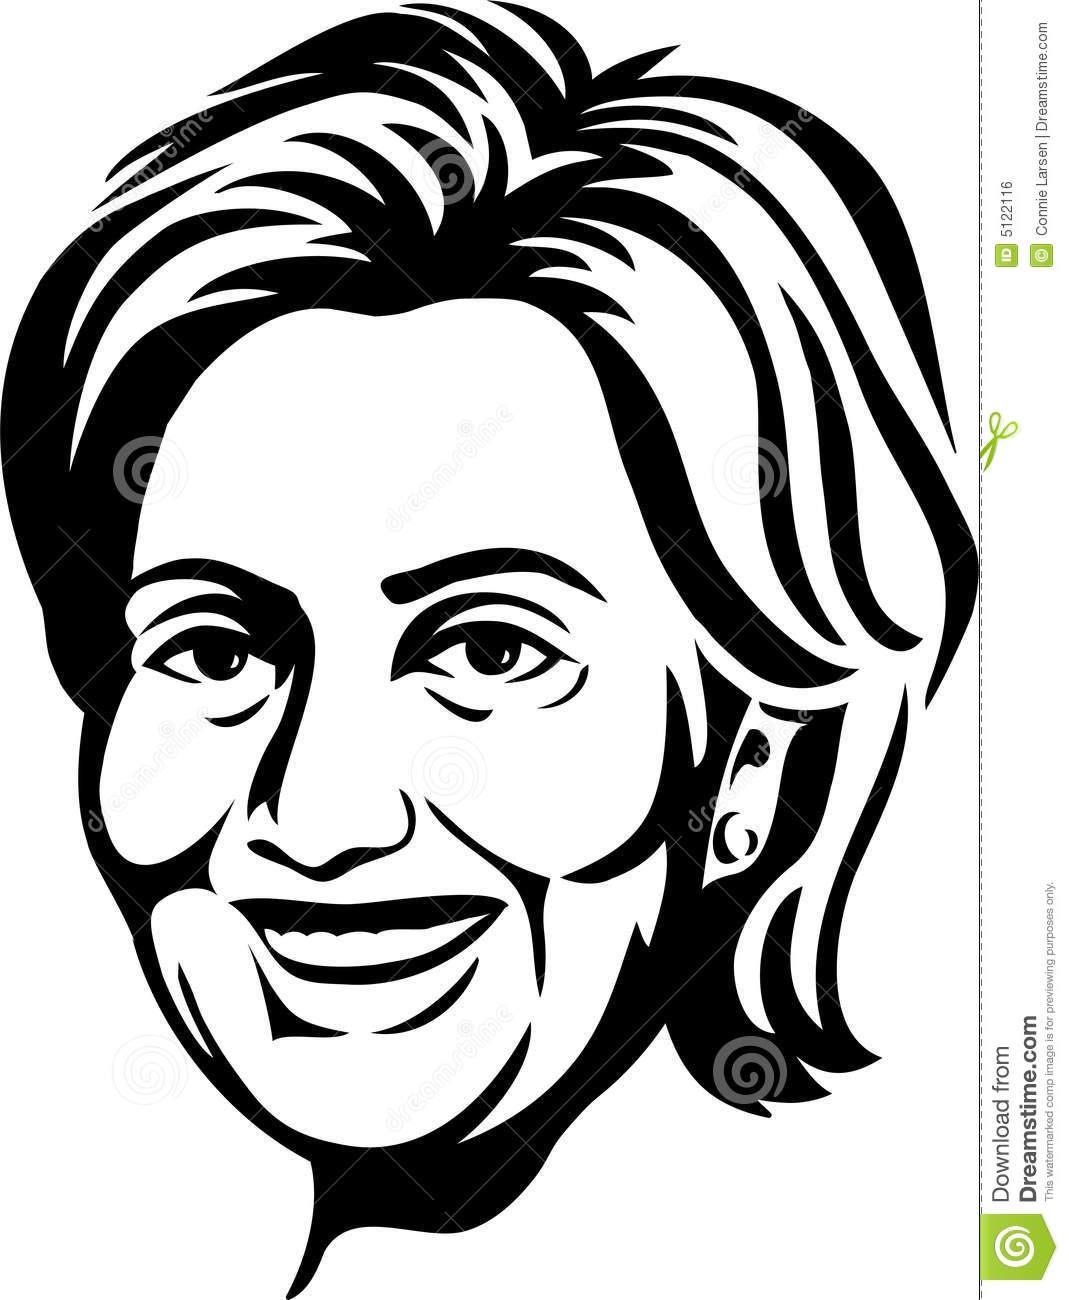 Clinton clipart.